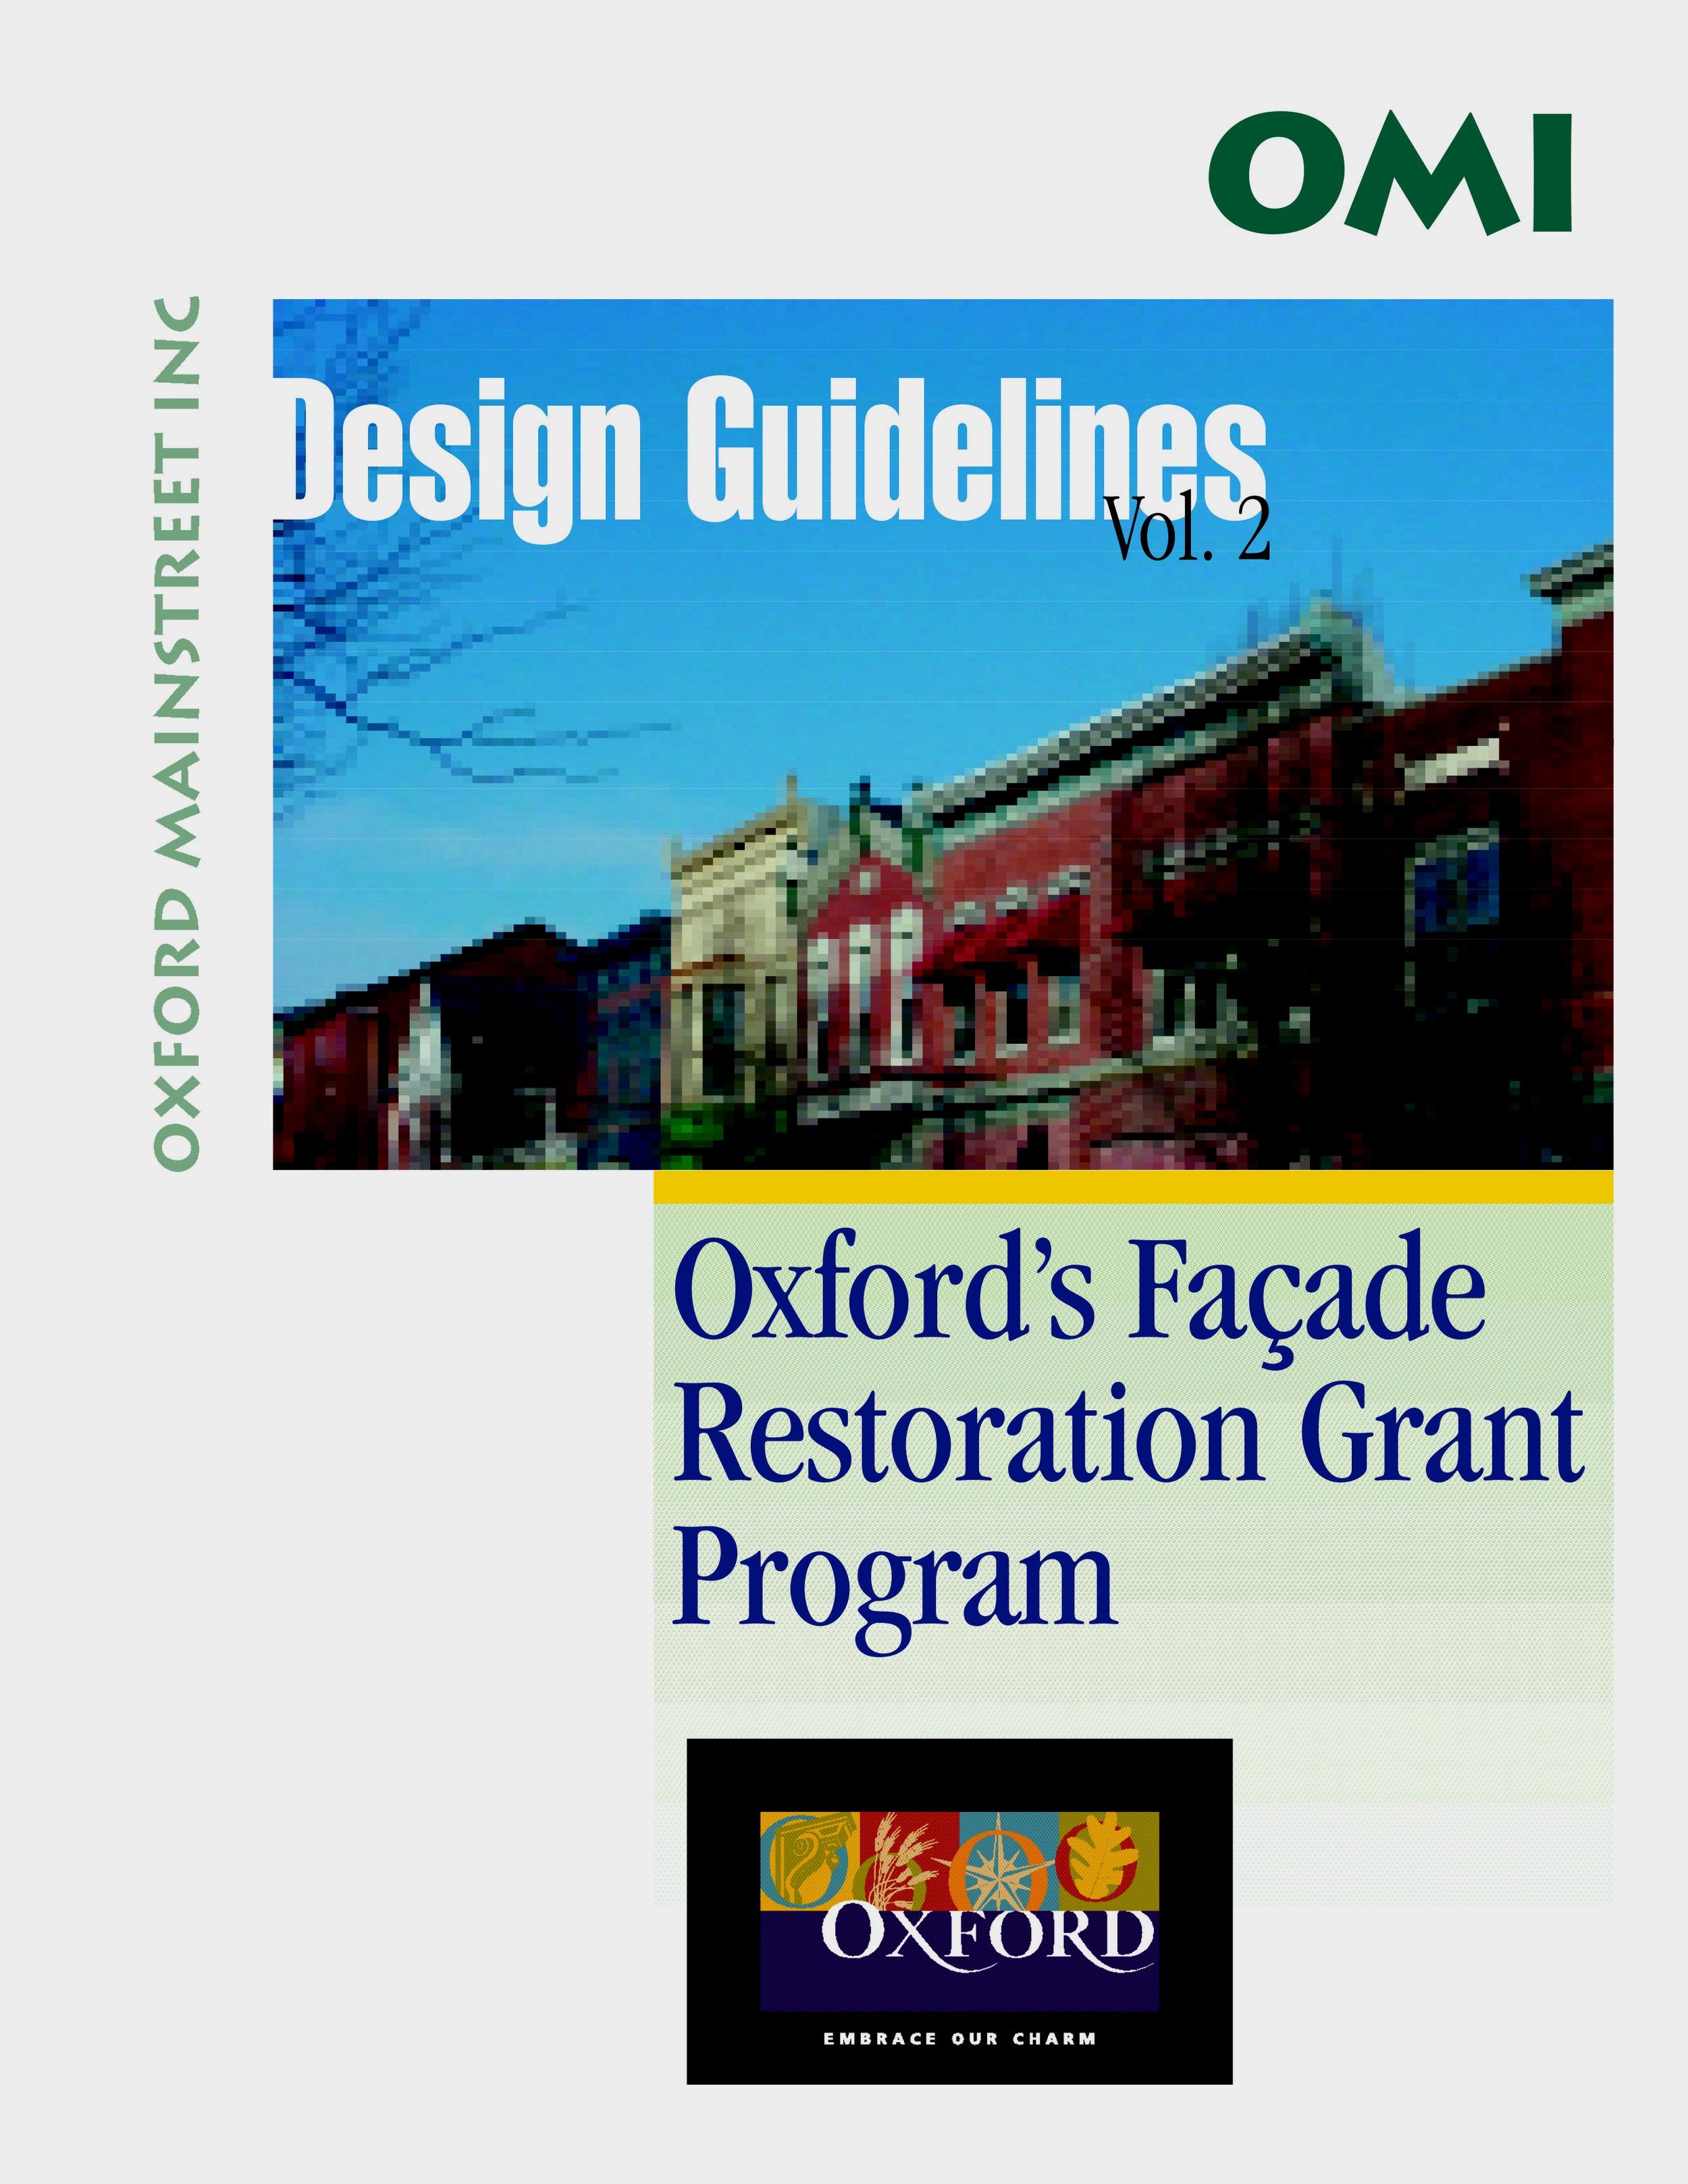 OMI Design Guidelines -